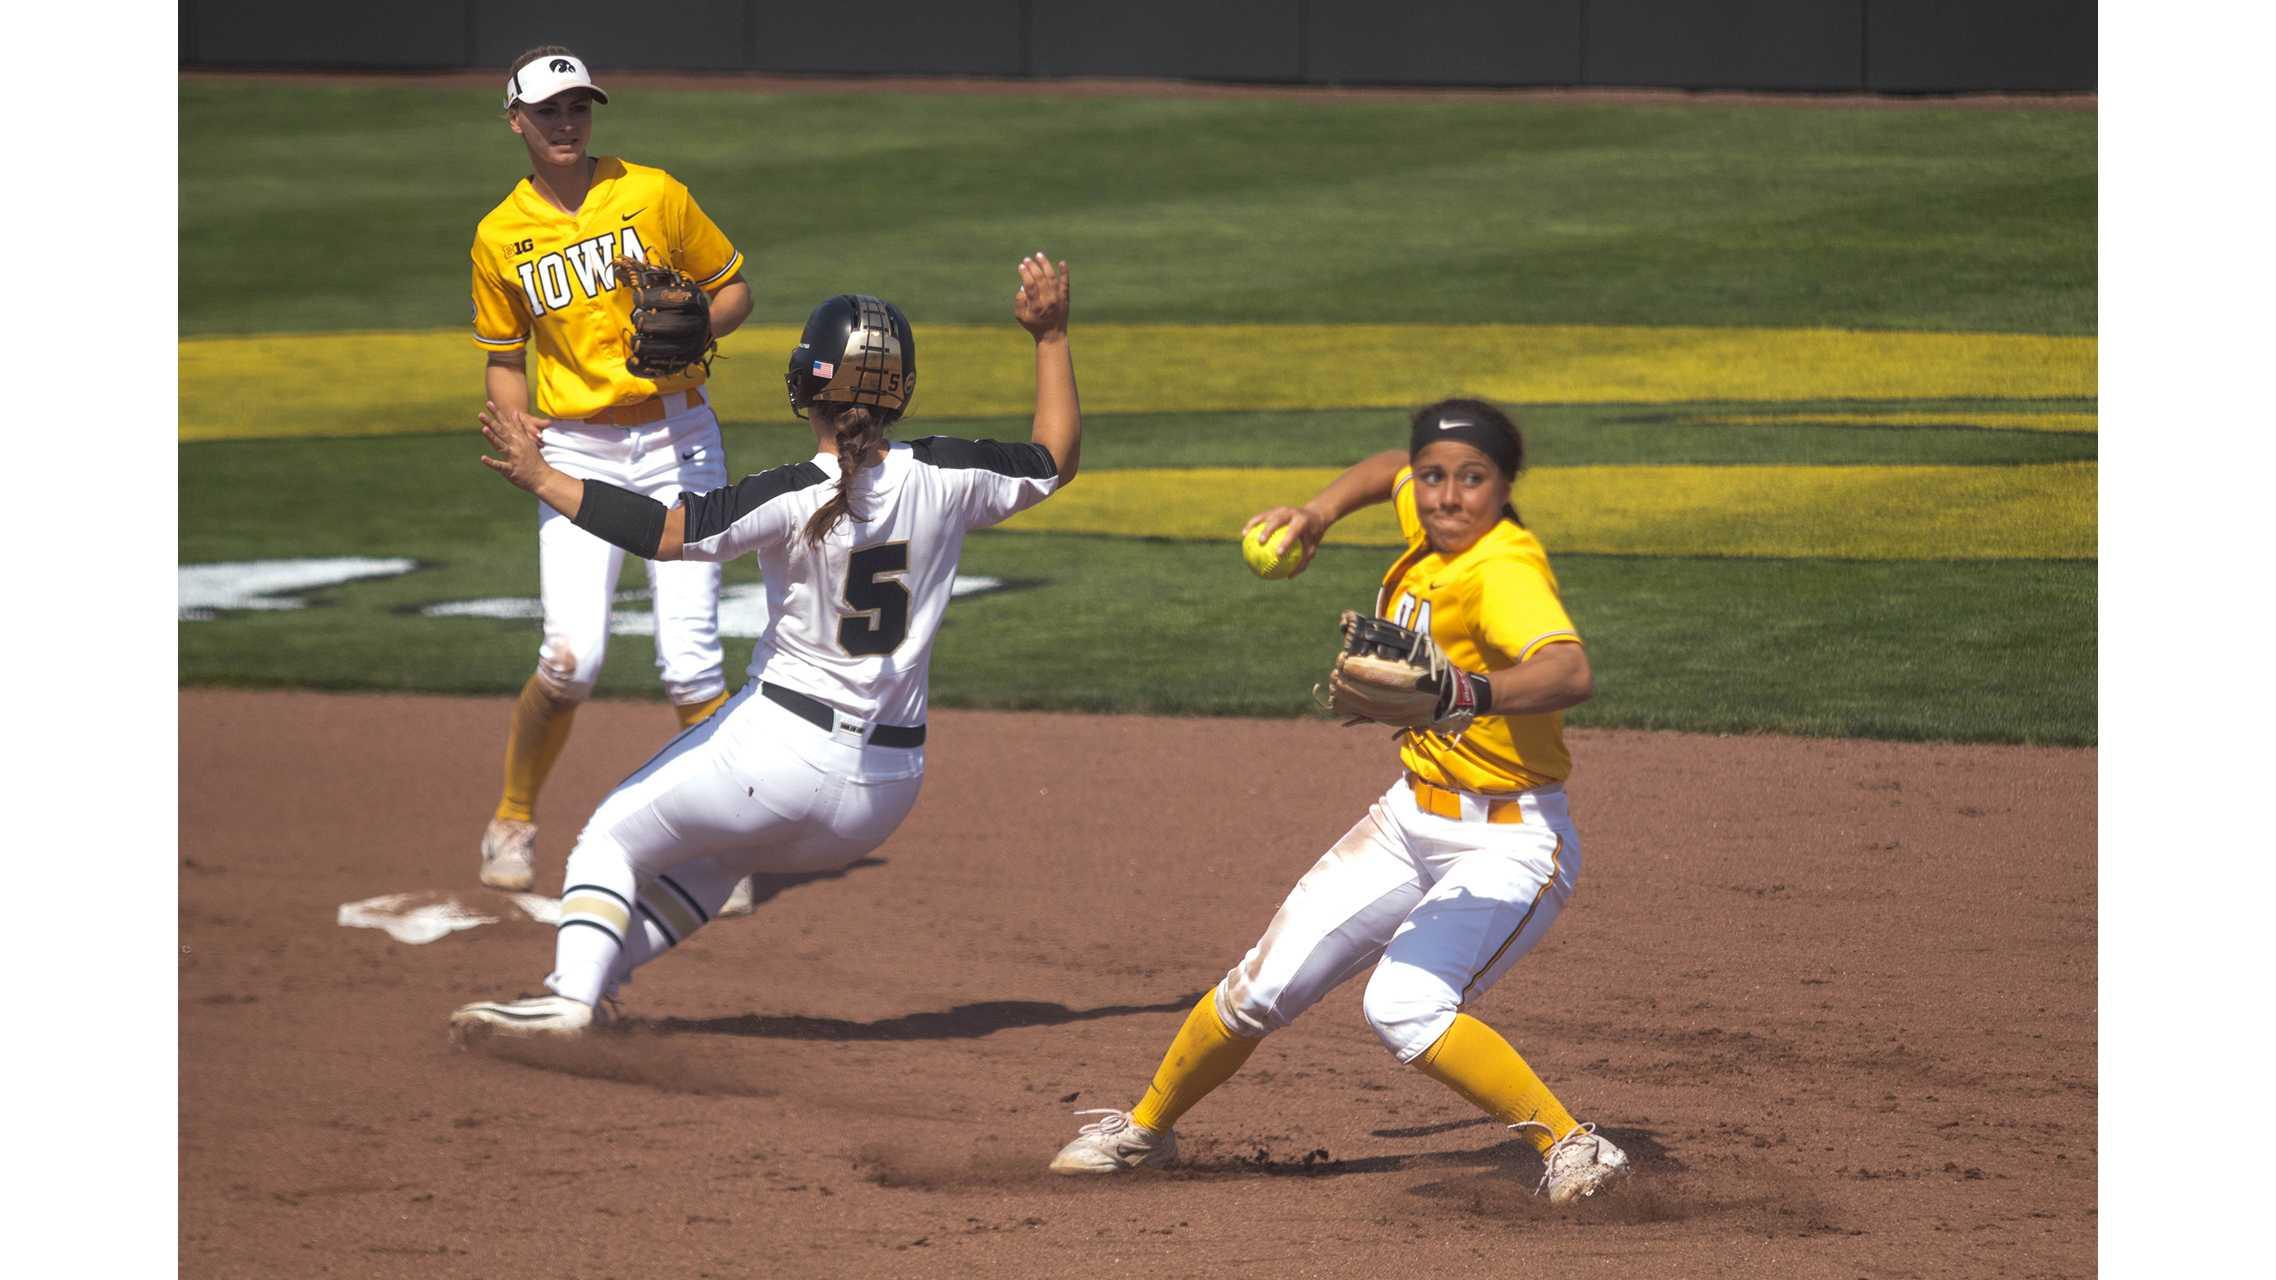 Photos: Iowa softball vs. Purdue (05/05/18)